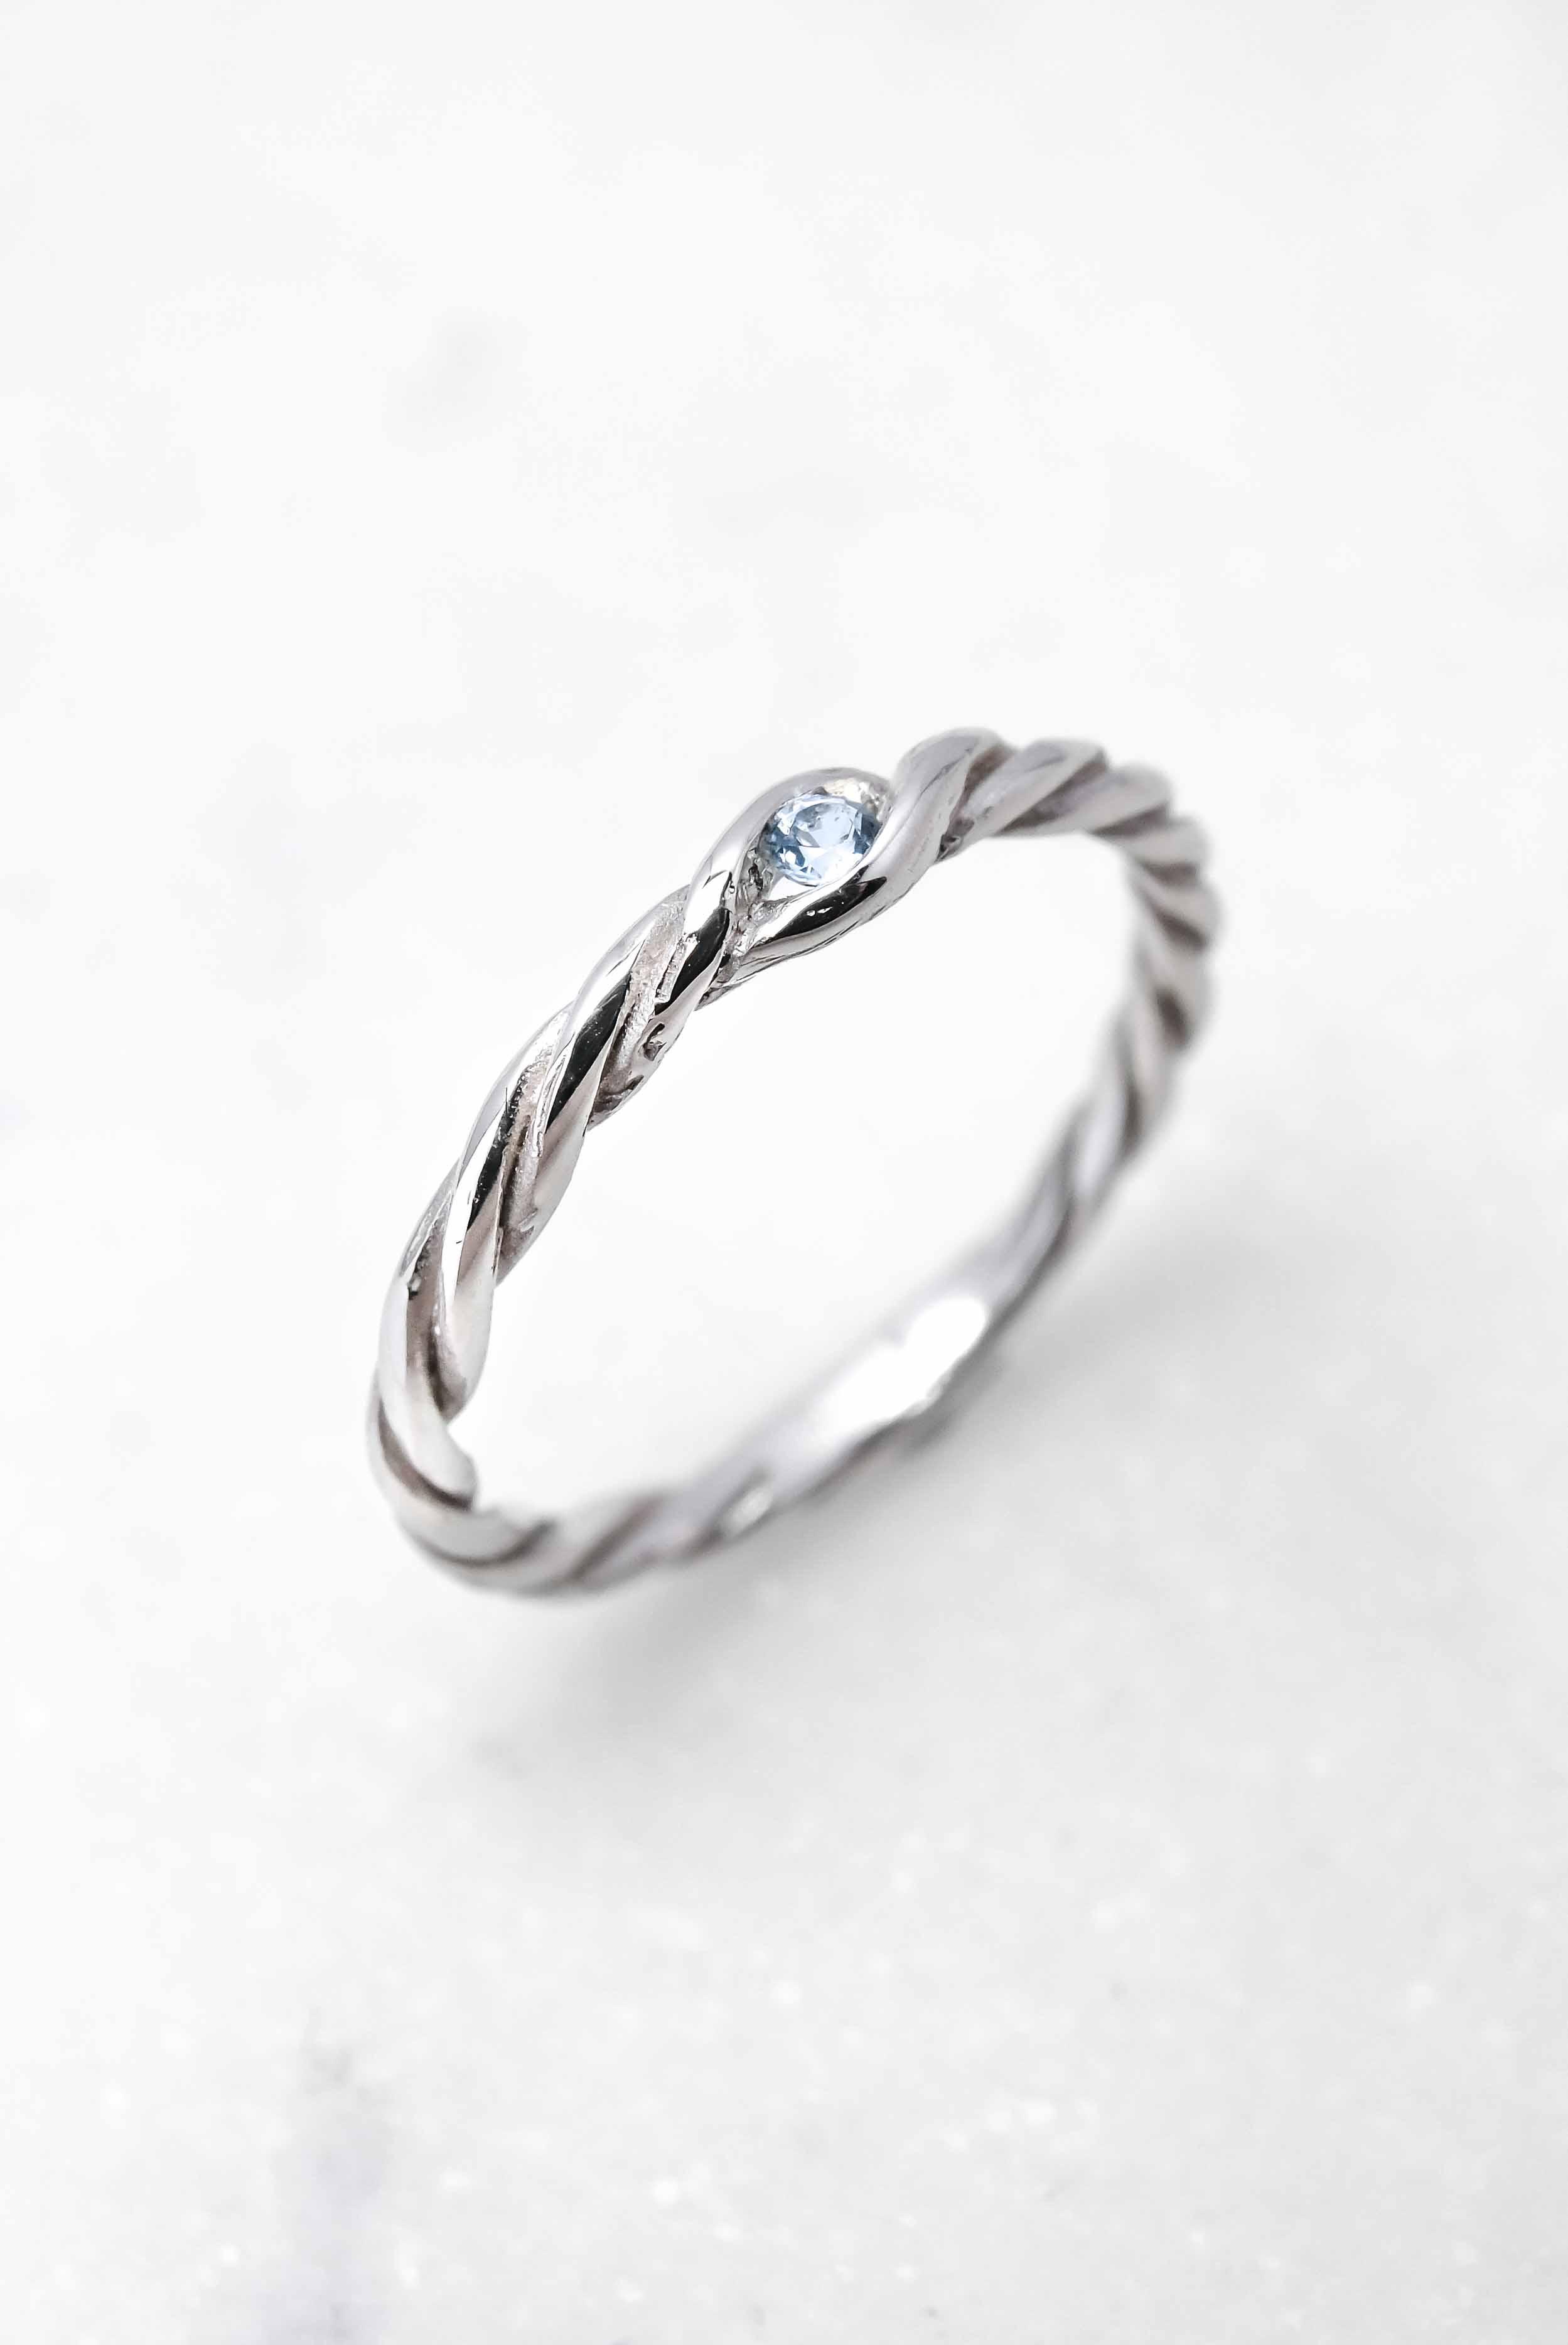 women-jewelry-wedding-ring-white-gold-aquamarine-theblackalchemy-3.jpg